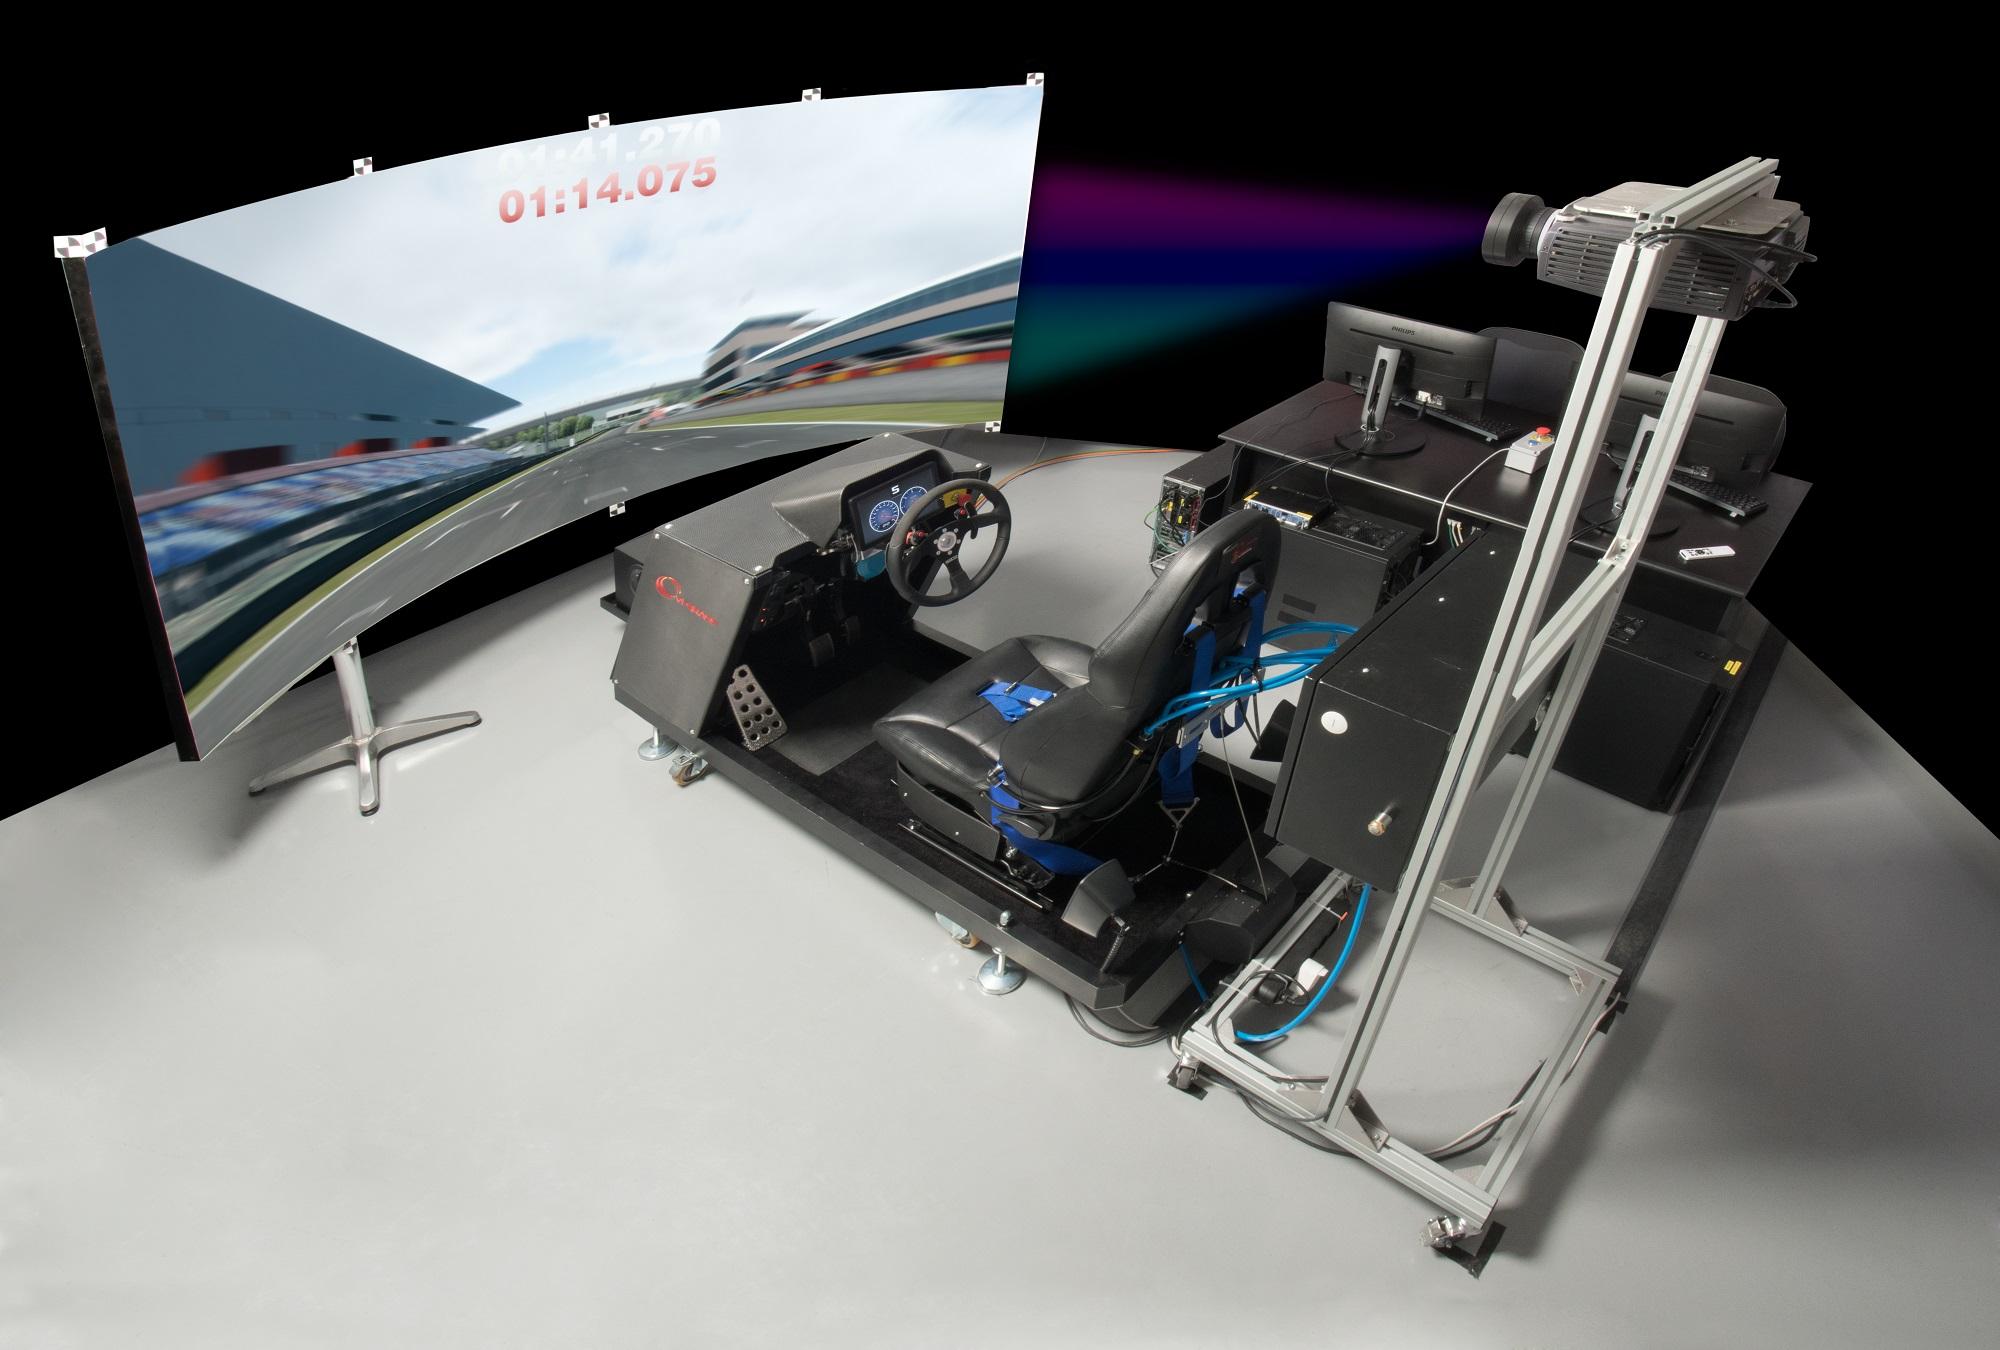 Driving simulator for advanced vehicle development at Subaru